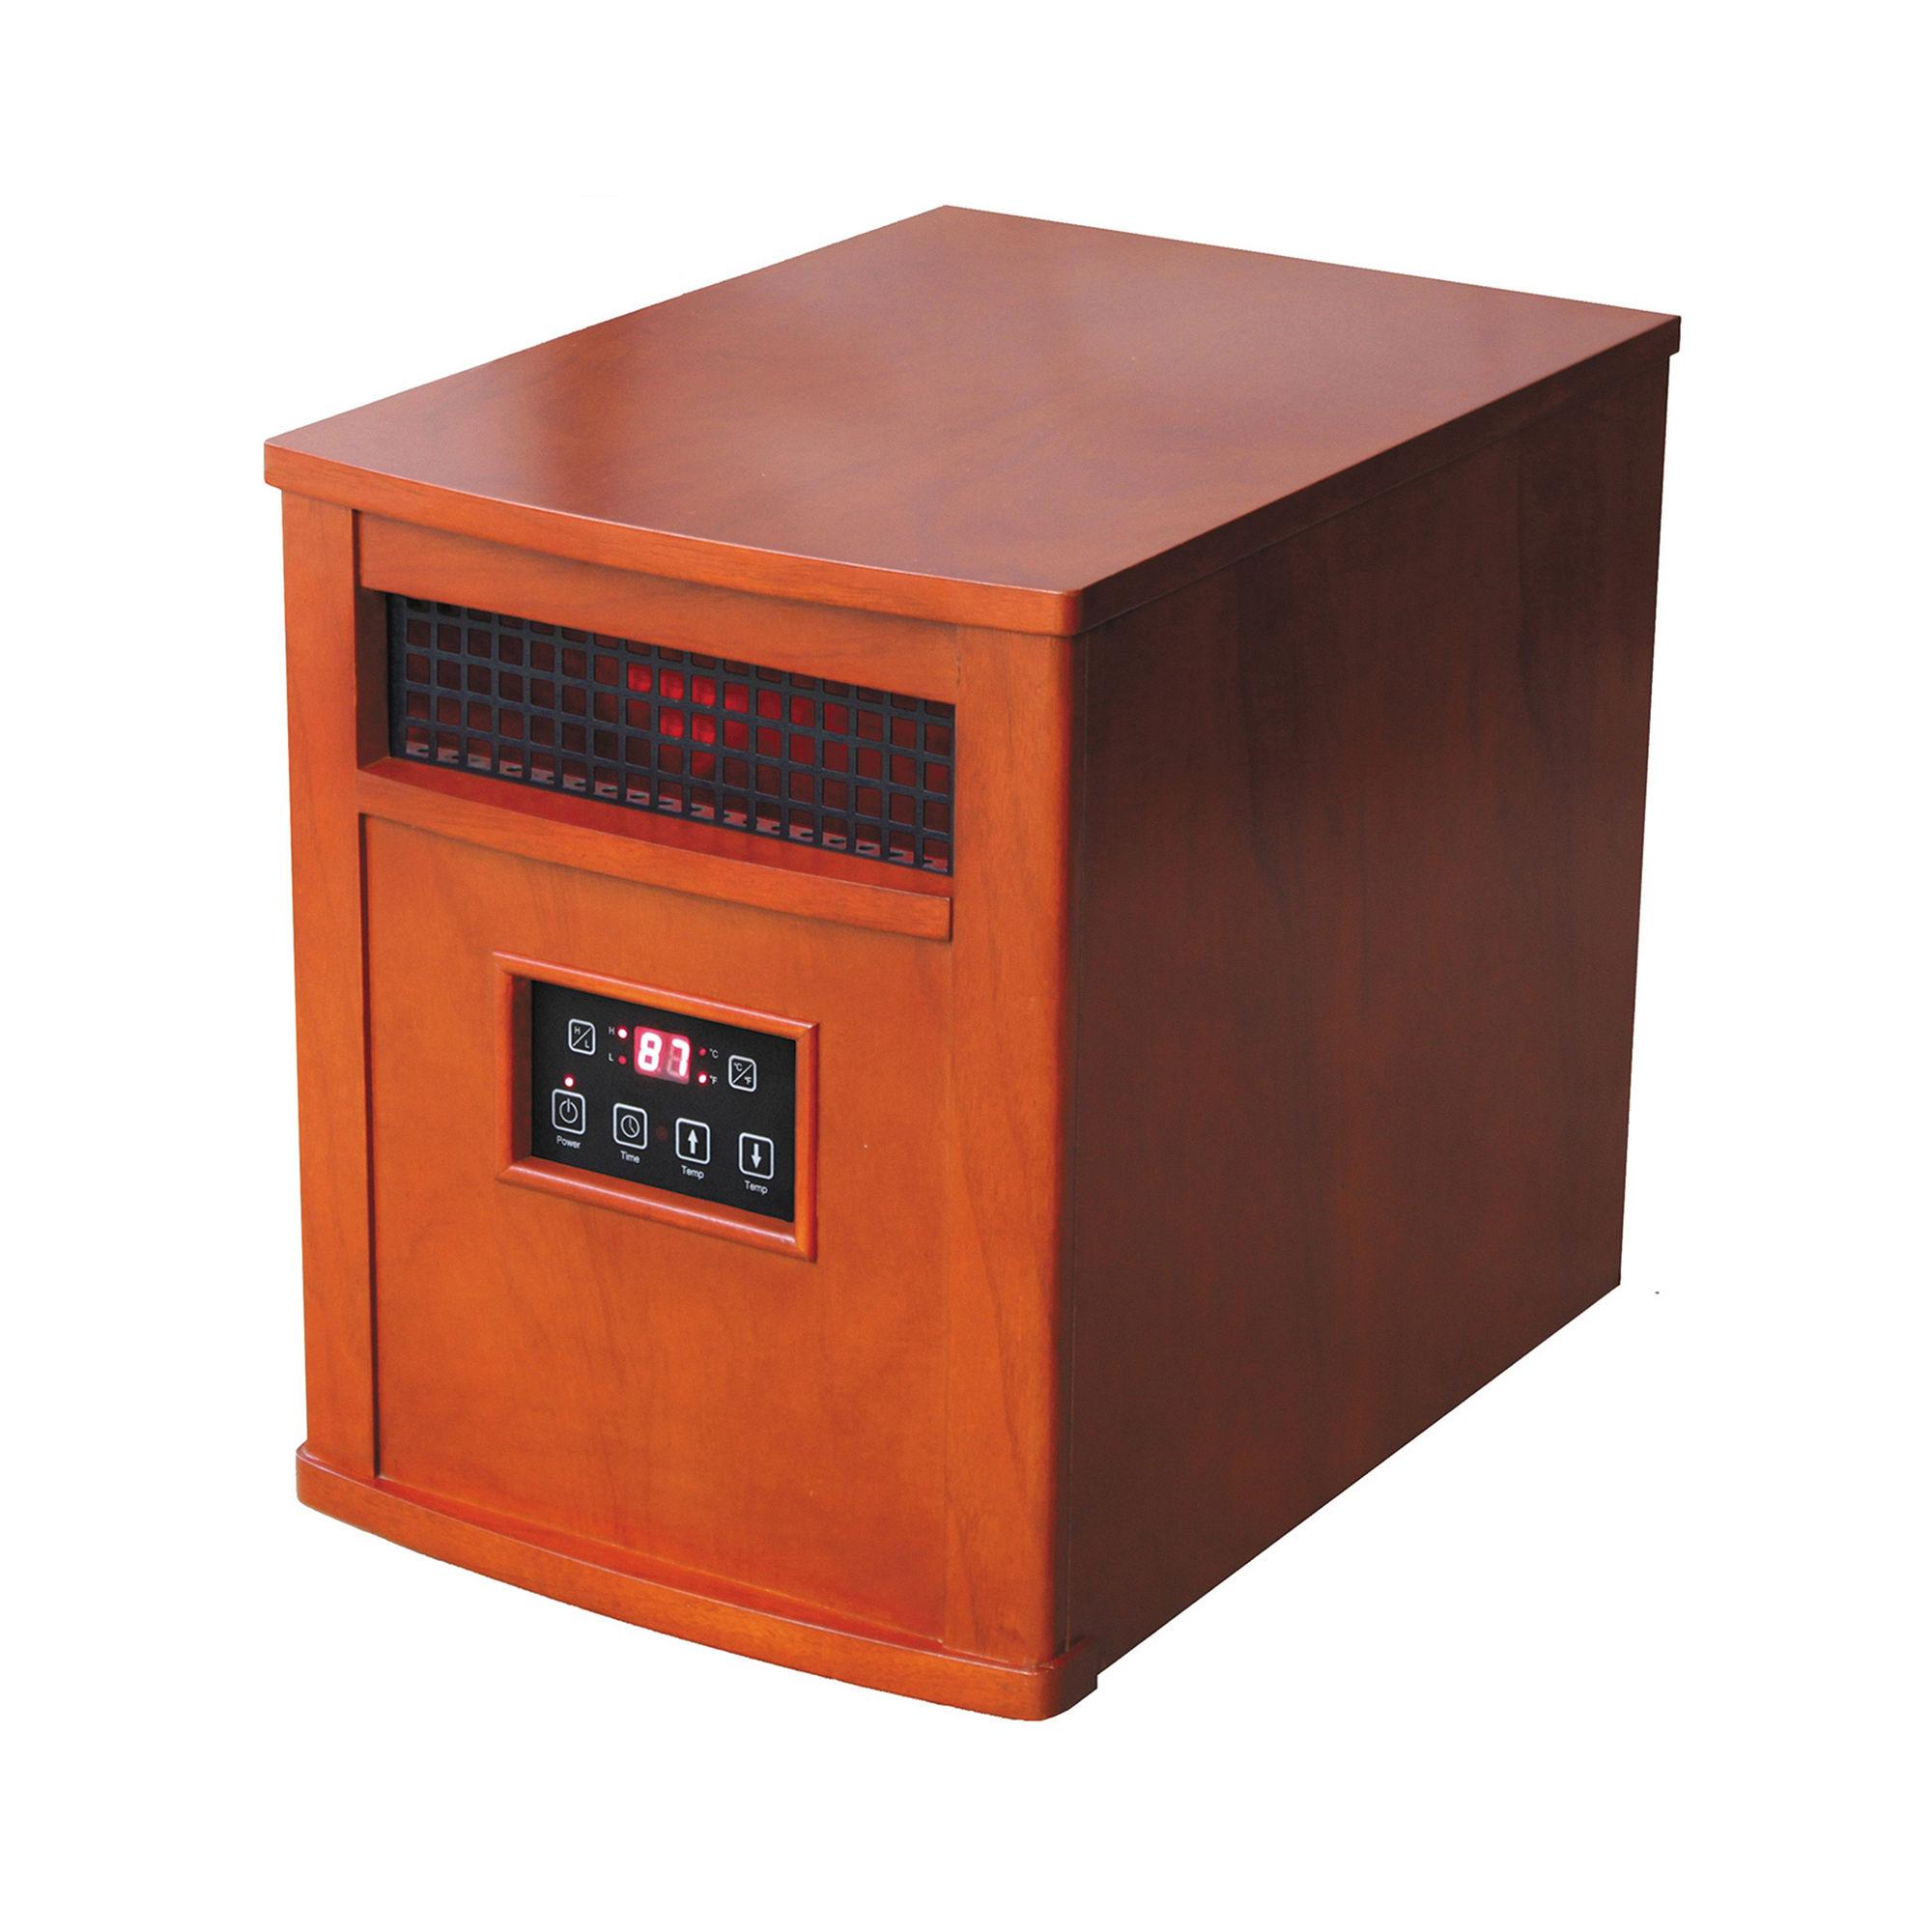 American Comfort Infrared Quartz Heater 5200 Btu 1500 Watts Oak Finish  #AA4221